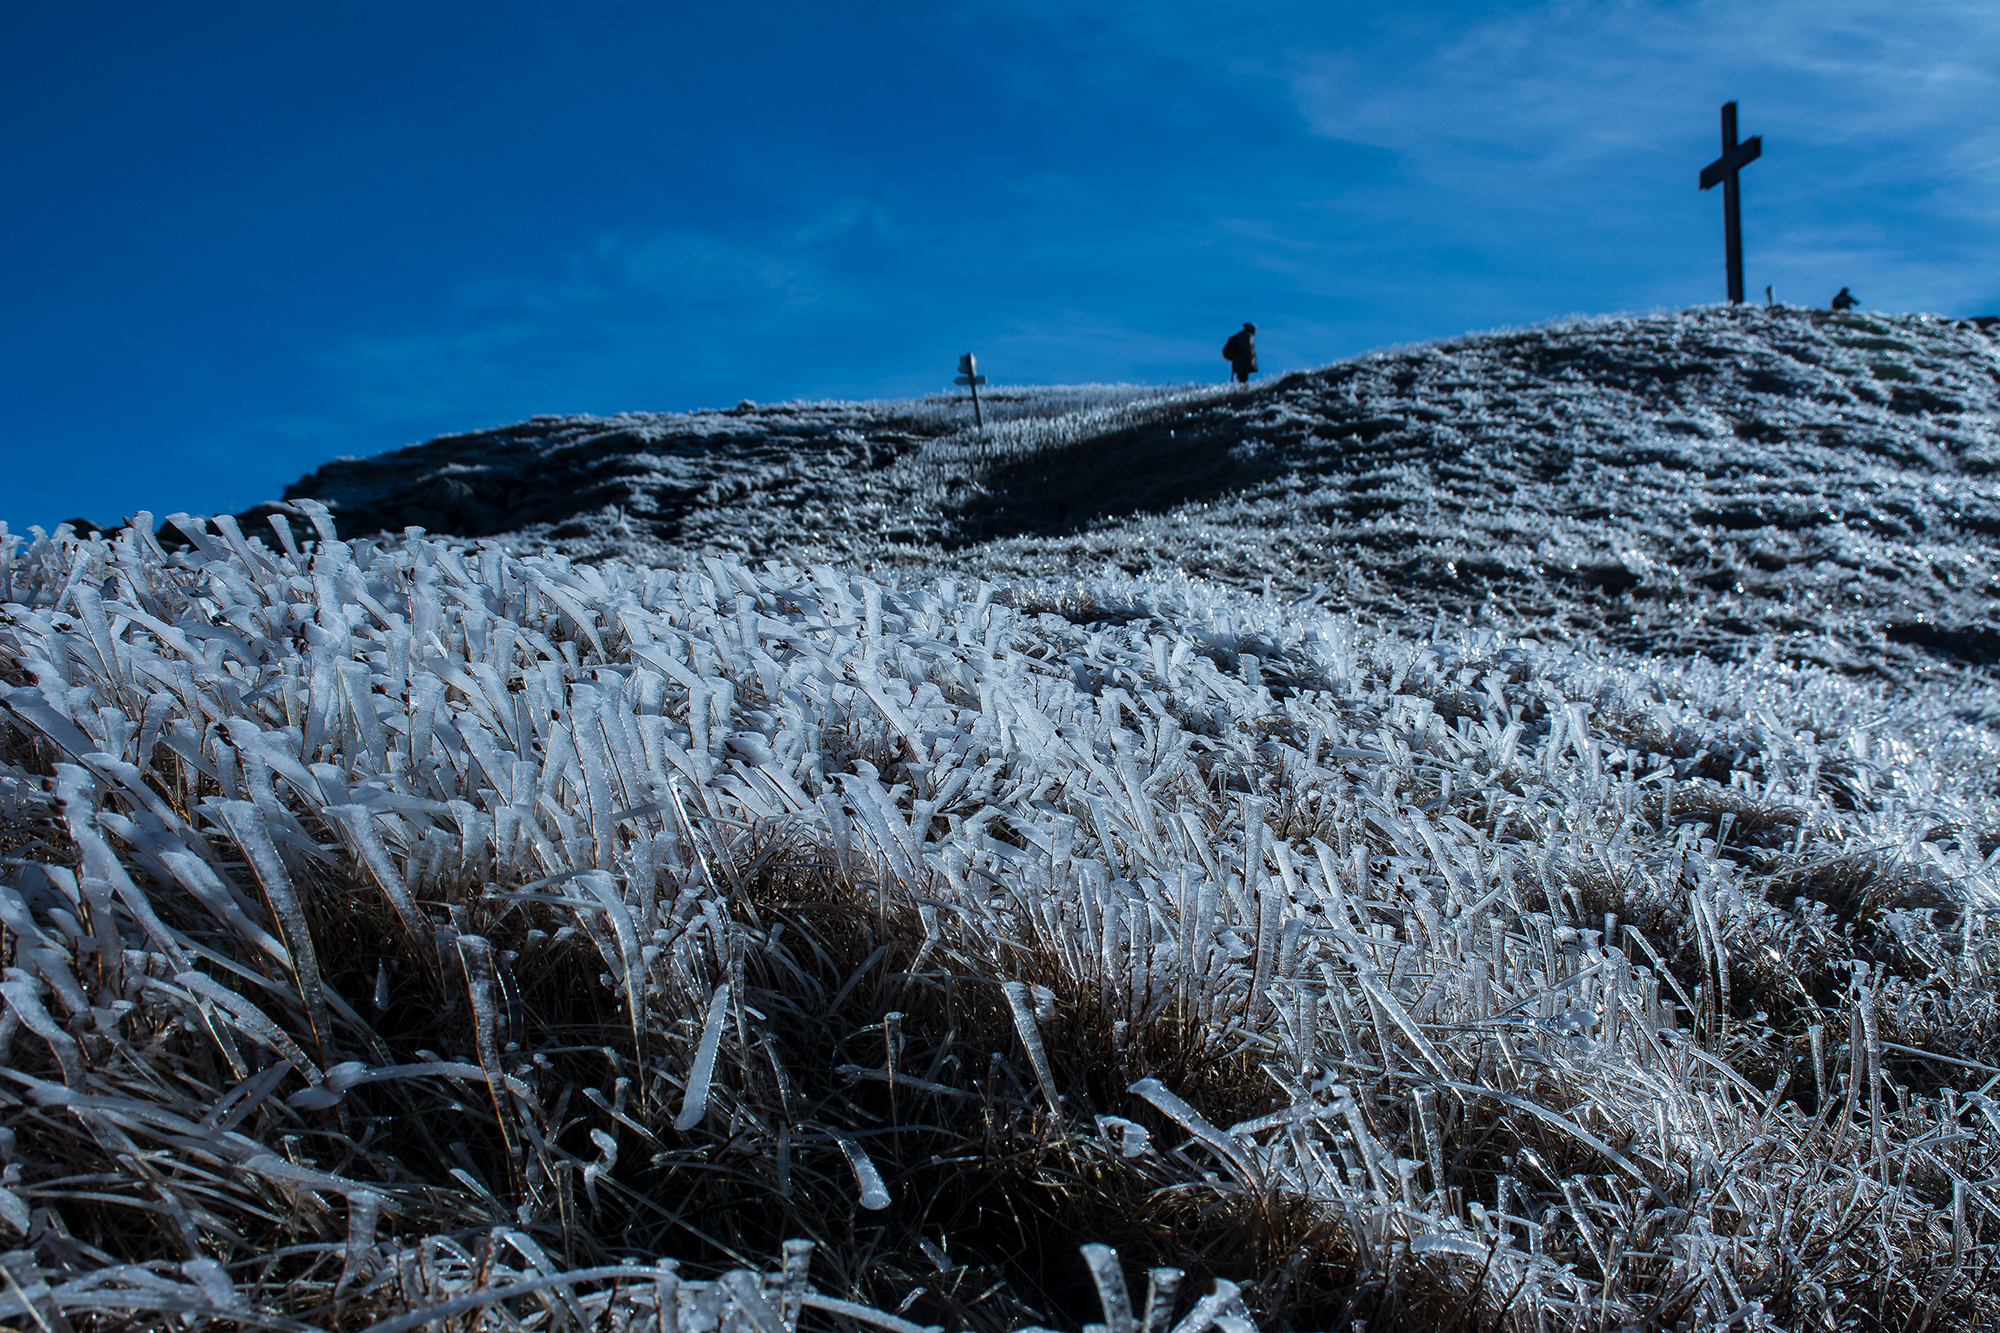 Arrival on the frozen summit...